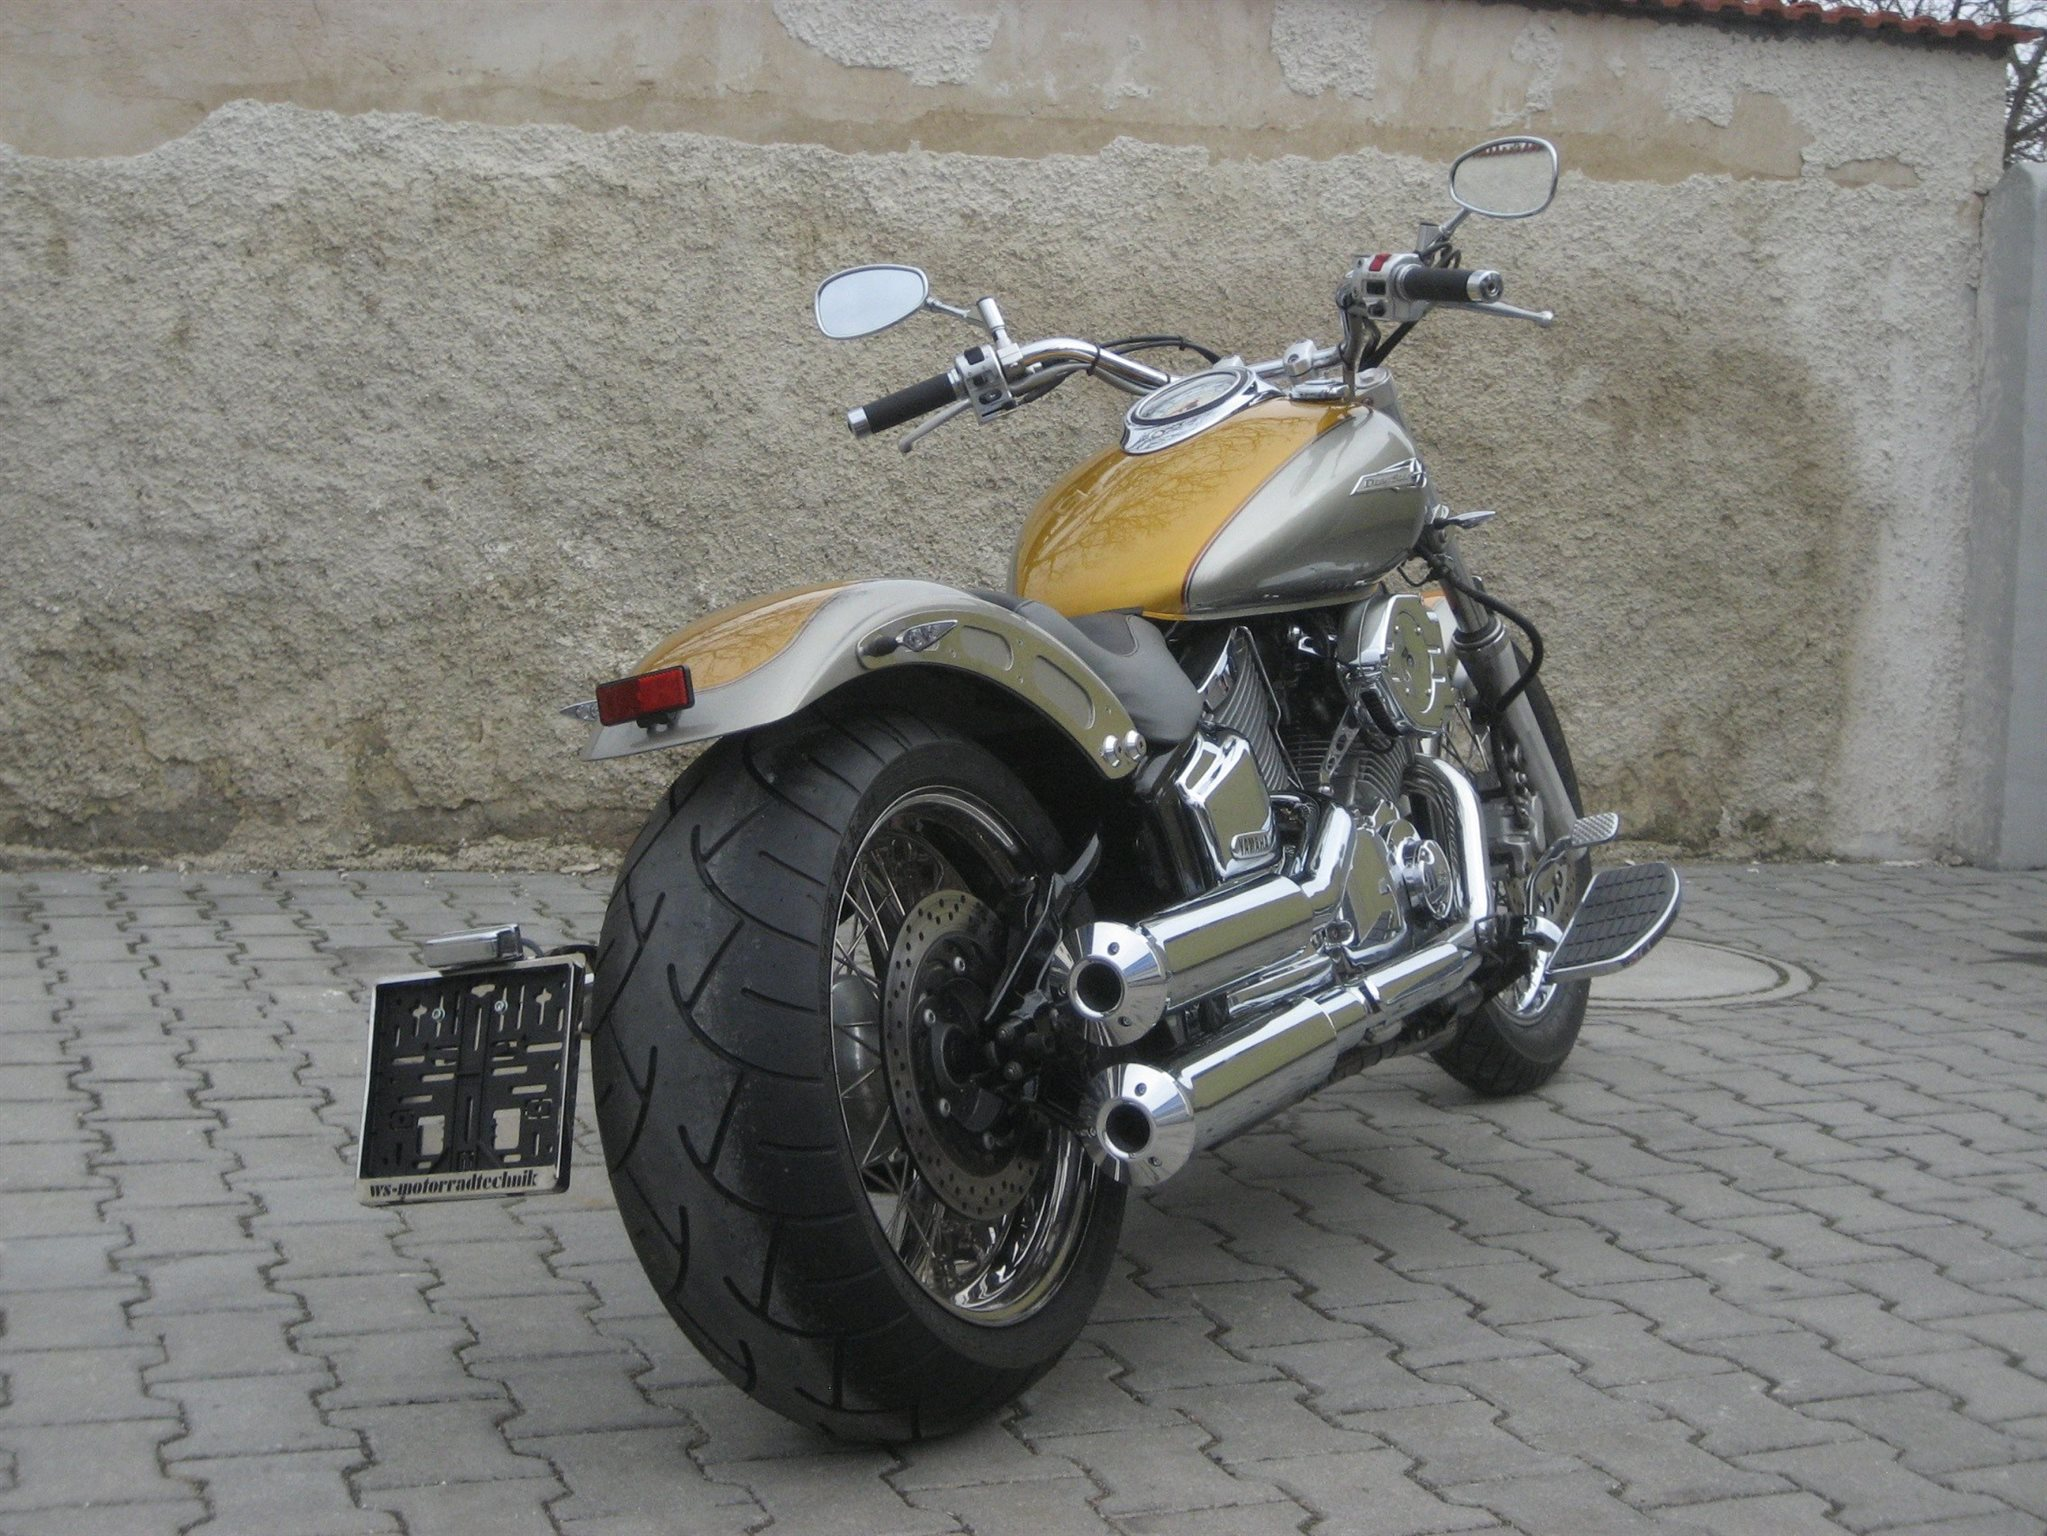 umgebautes motorrad yamaha xvs 1100 drag star von ws. Black Bedroom Furniture Sets. Home Design Ideas